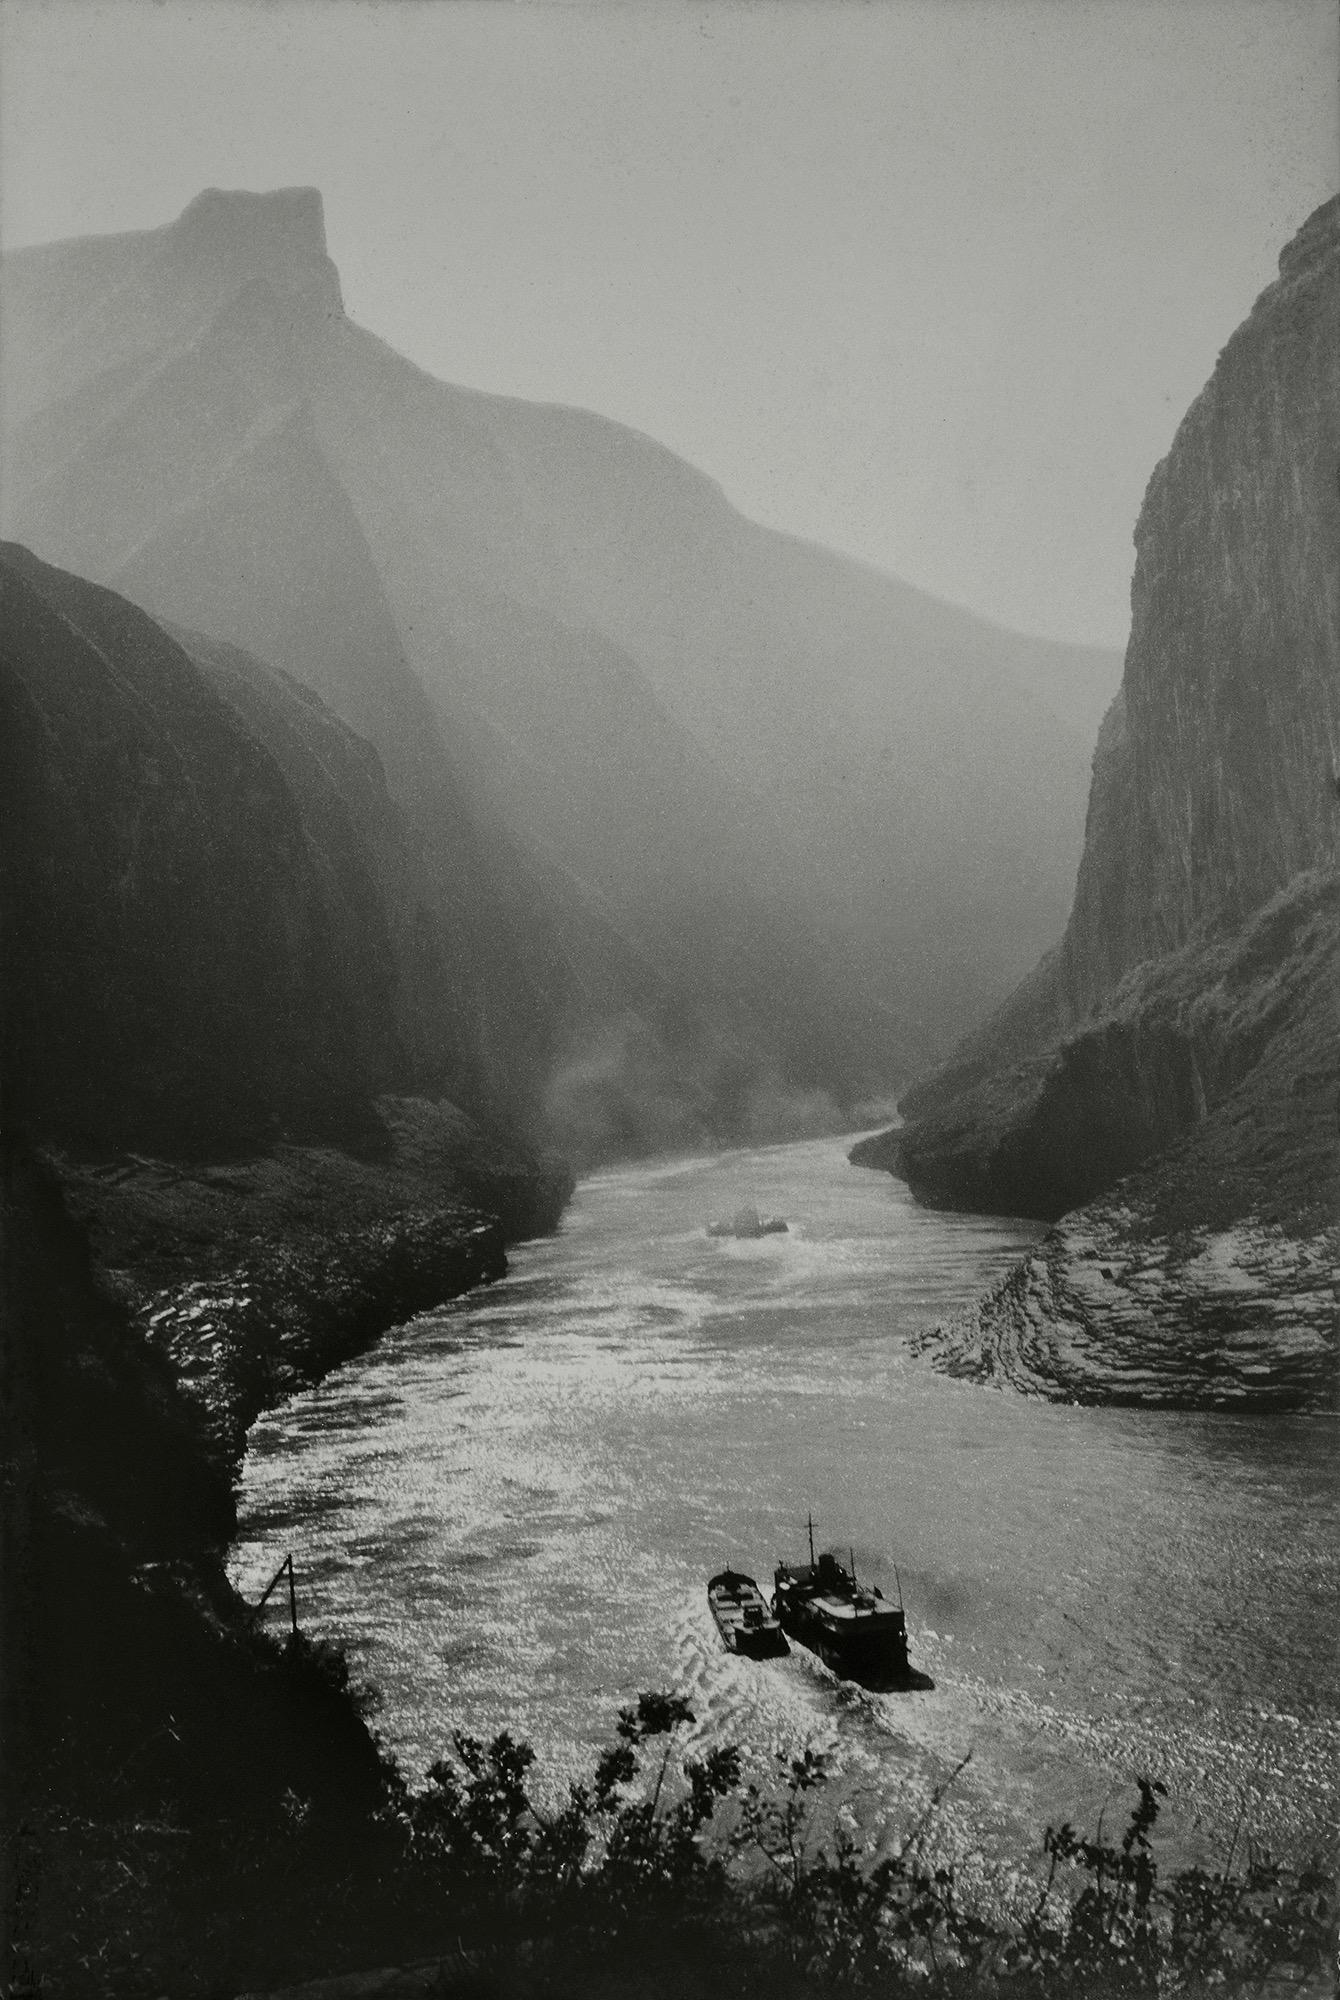 xue-zijiang-china-1950s-photography-of-china-4.jpeg